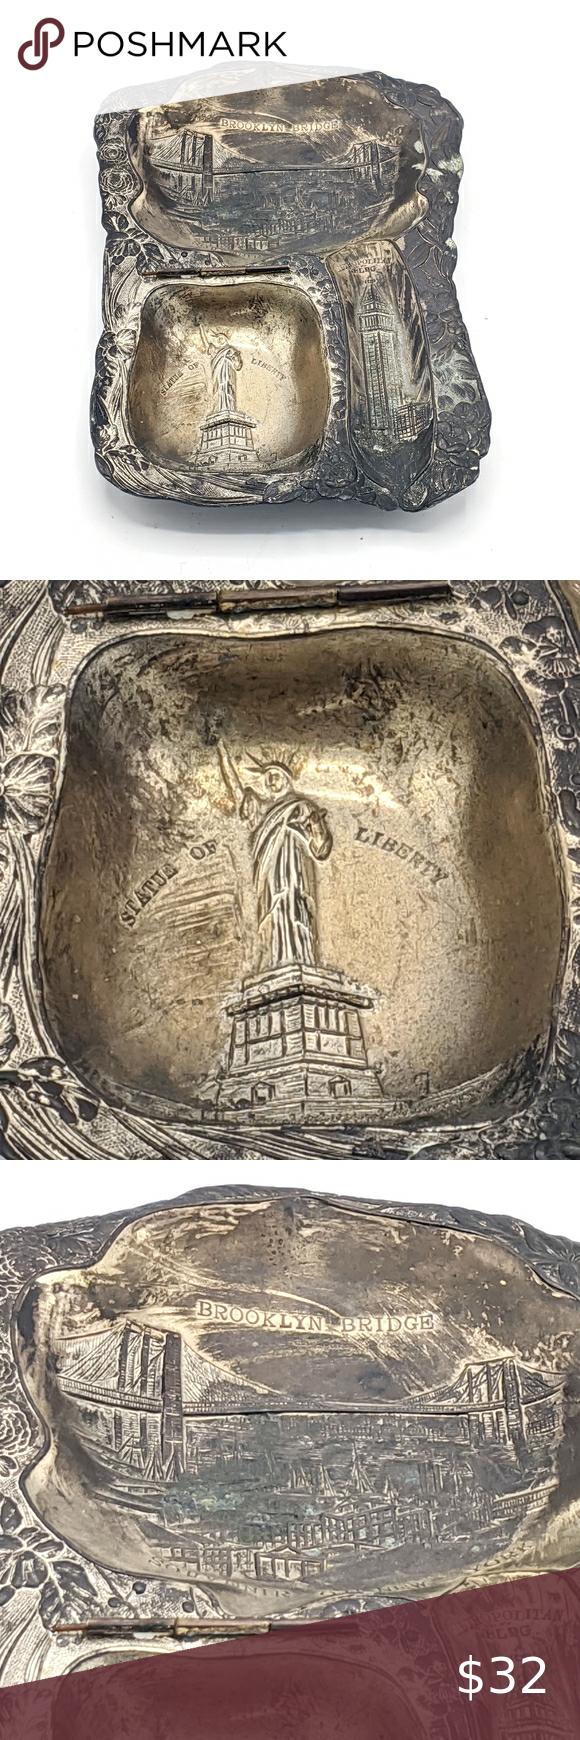 New York City Souvenir Ashtray Metal Vintage Vintage Metal Souvenir Ashtray with...#ashtray #city #metal #souvenir #vintage #york